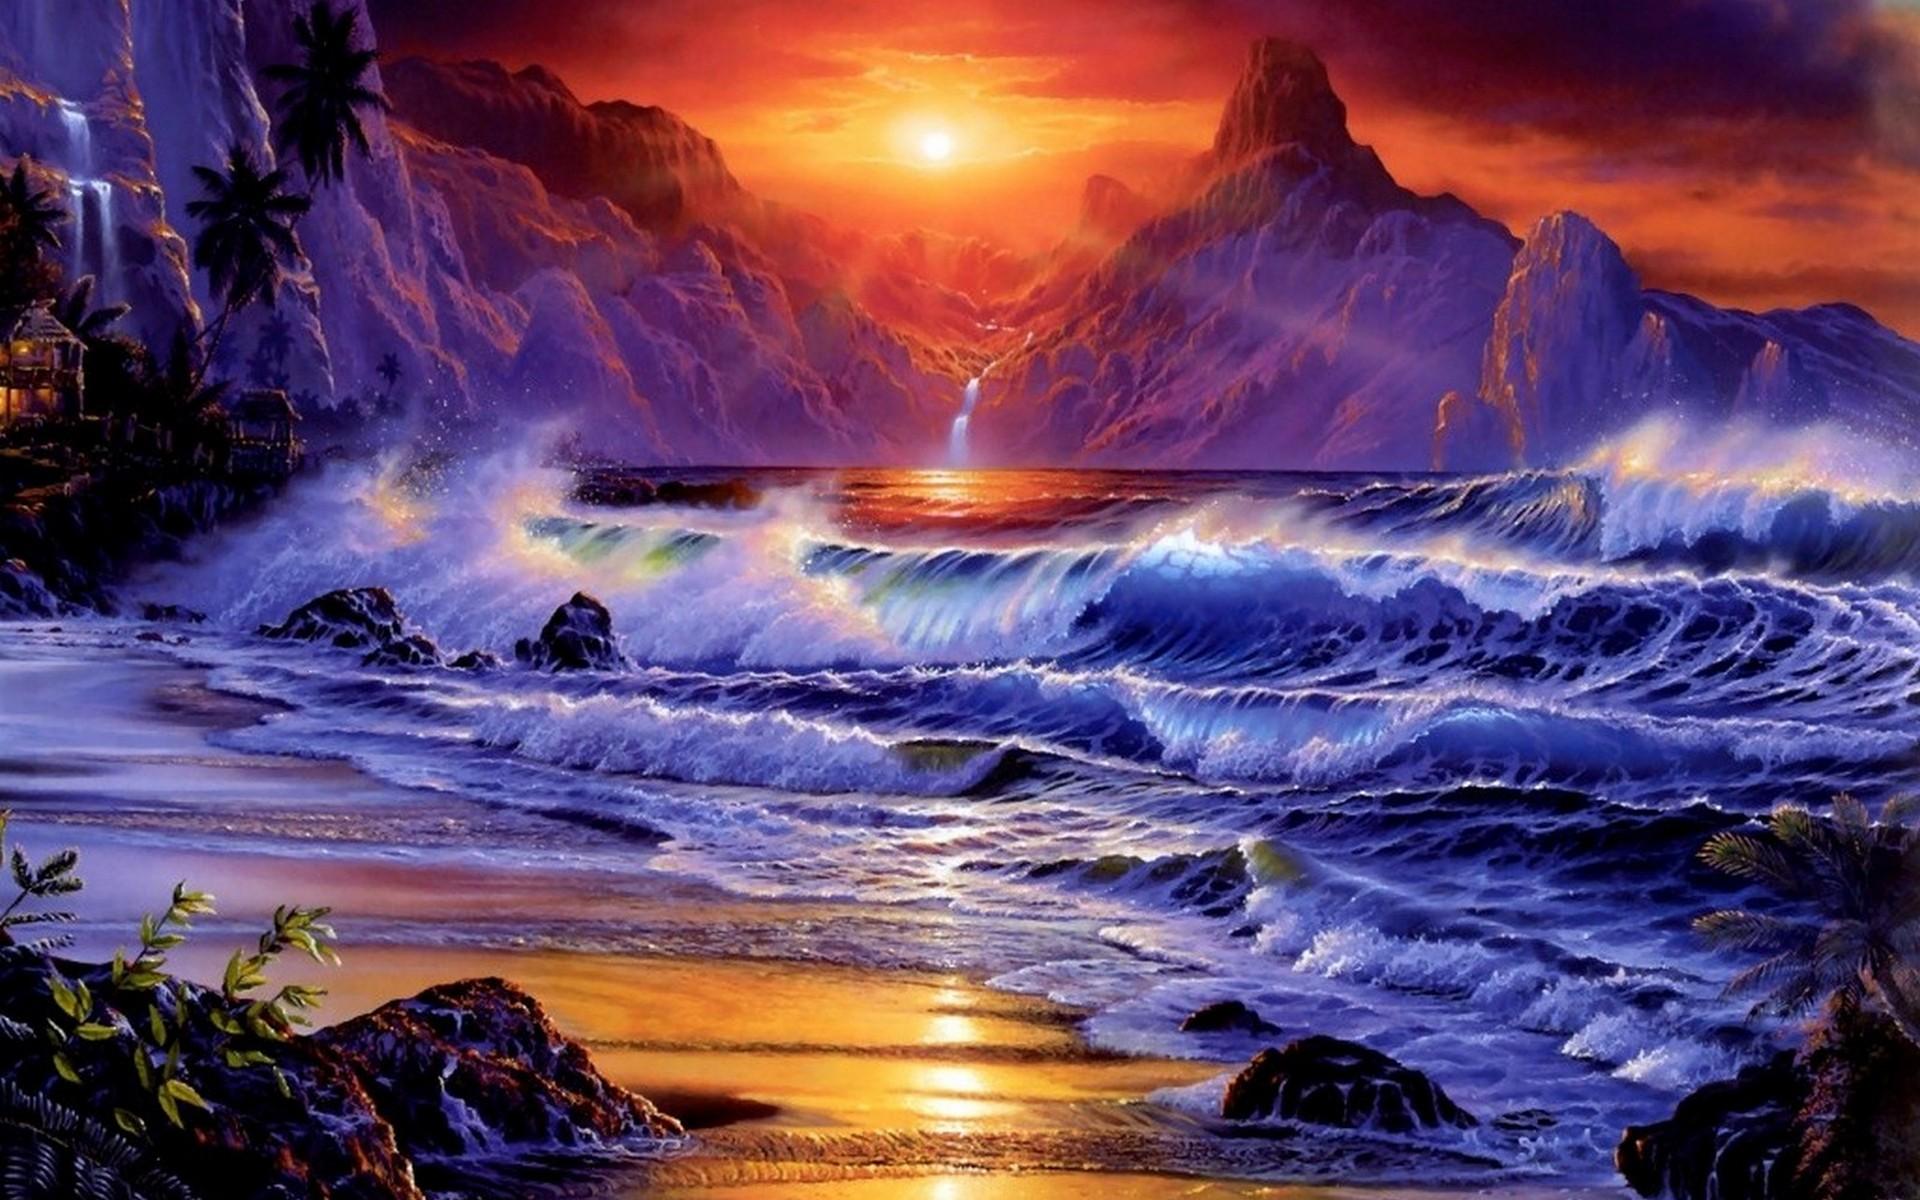 Sunsets Ocean Wallpaper 1920x1200 Sunsets, Ocean, Waves, Fantasy, Art ...